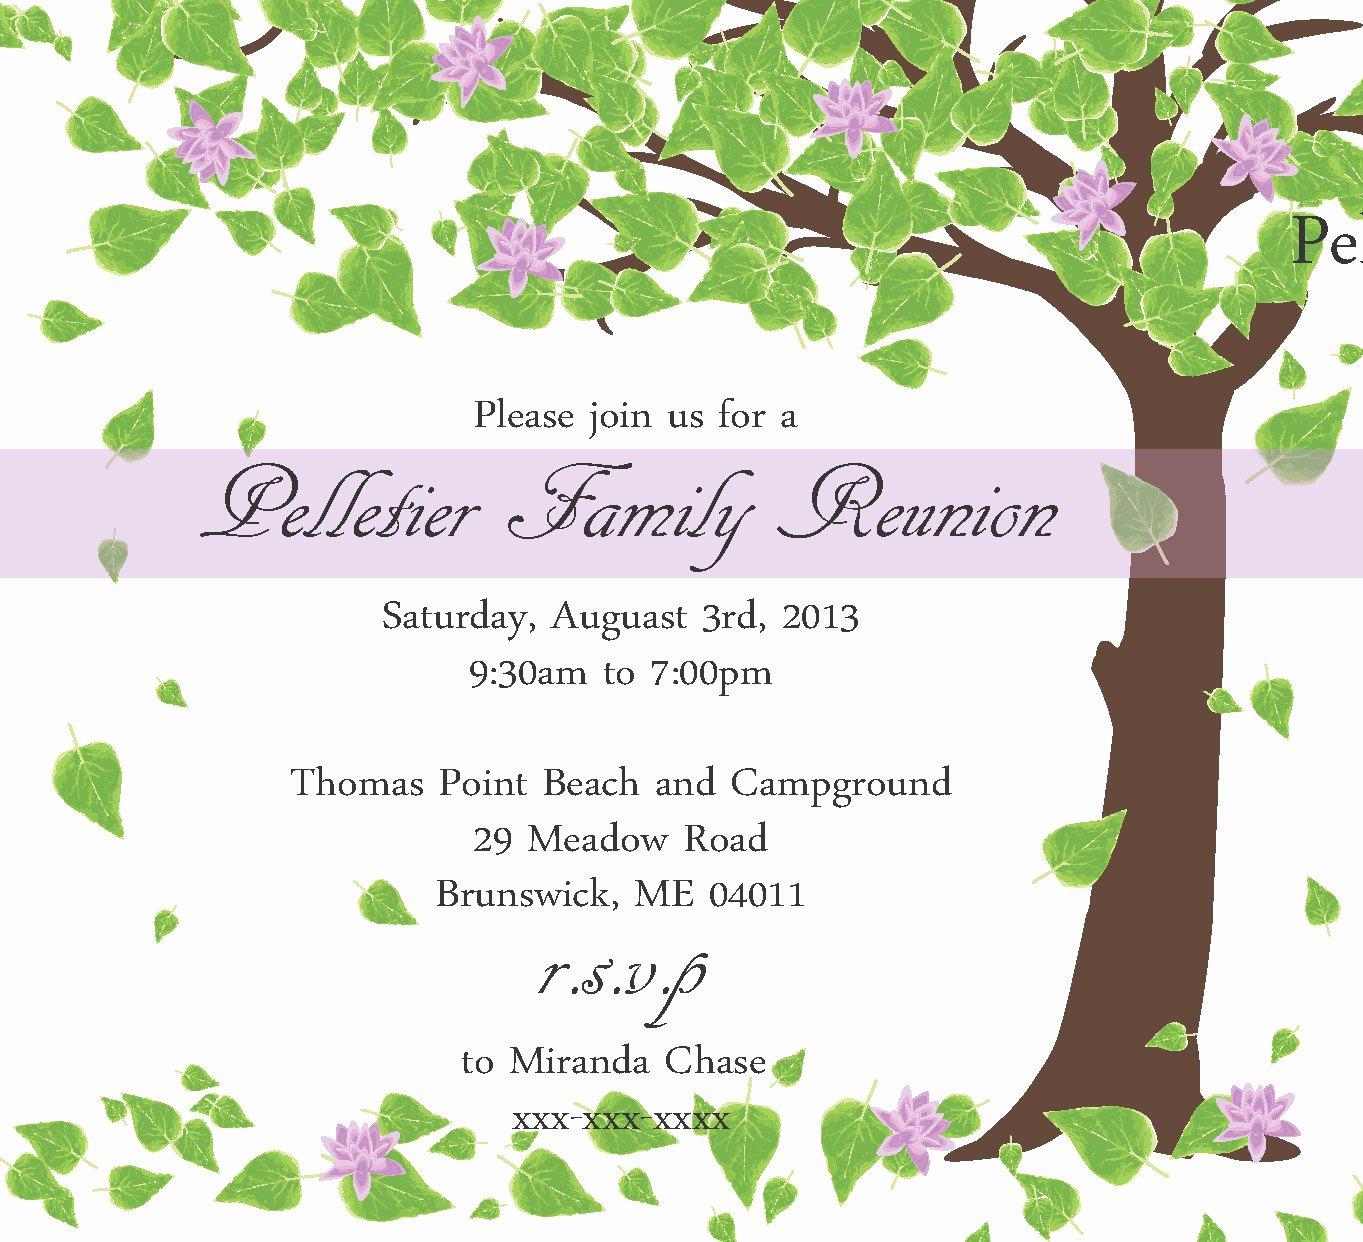 Family Reunion Flyer Template Inspirational Family Reunion Invitation